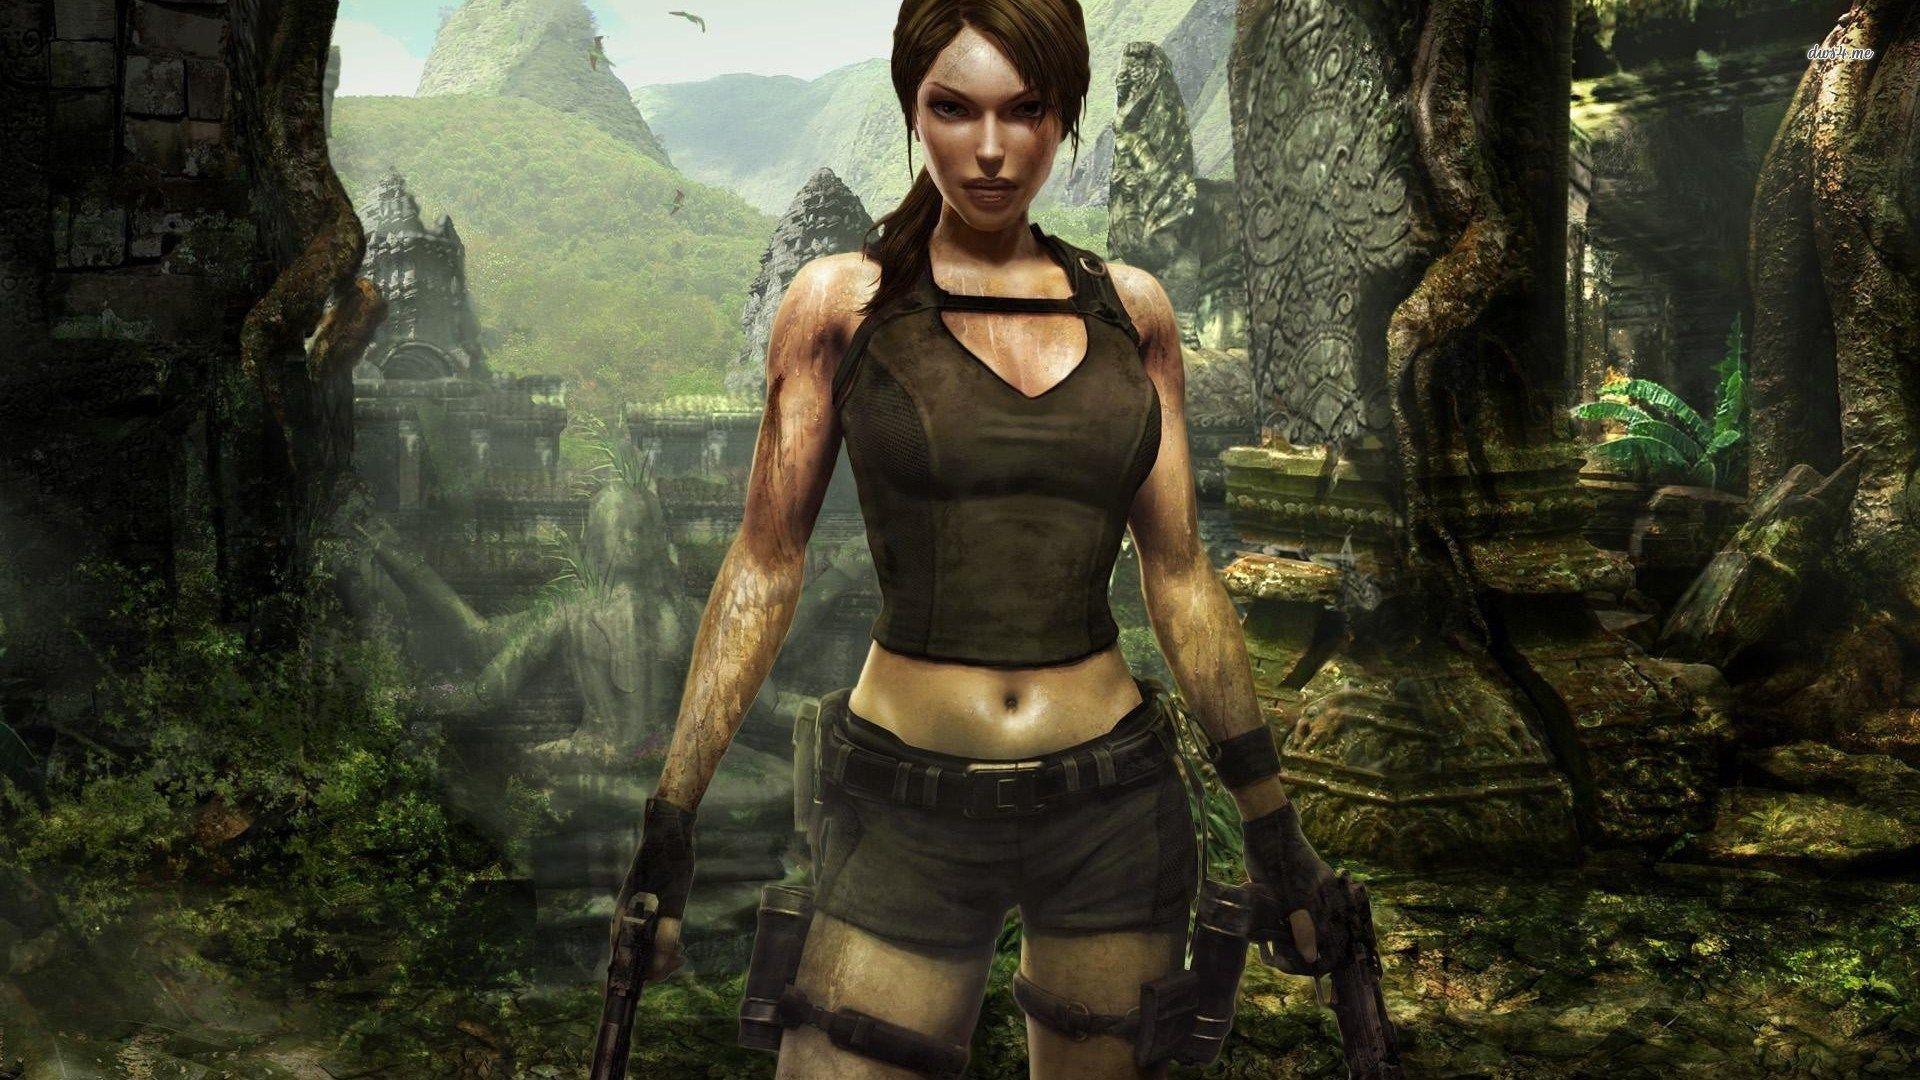 Magnificent Lara Croft In Tomb Raider Underworld Wallpaper Tomb Raider Lara Croft Lara Croft Wallpaper